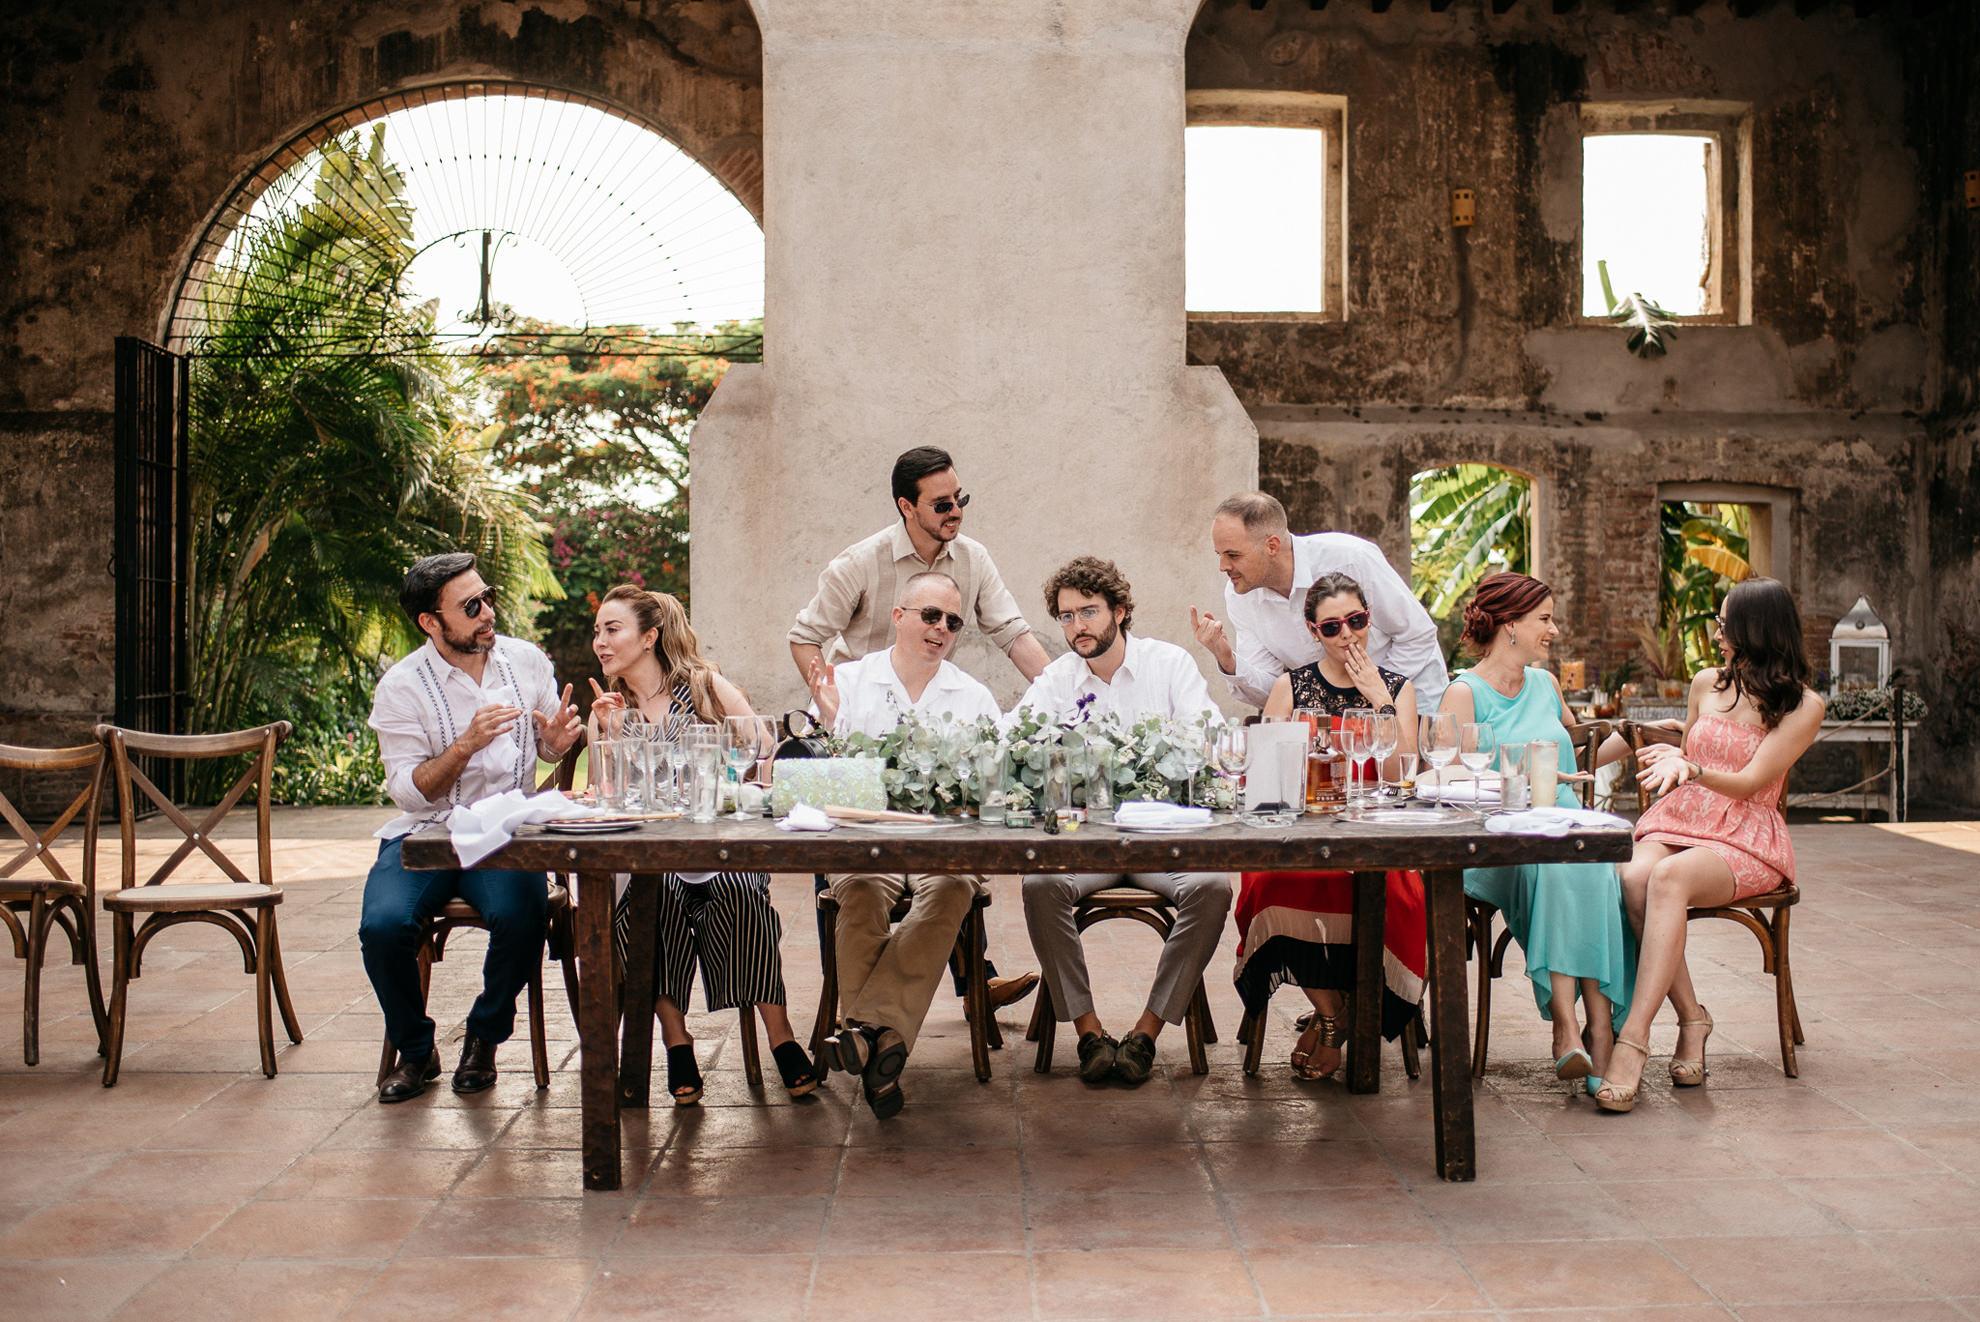 074 - hacienda san carlos.jpg